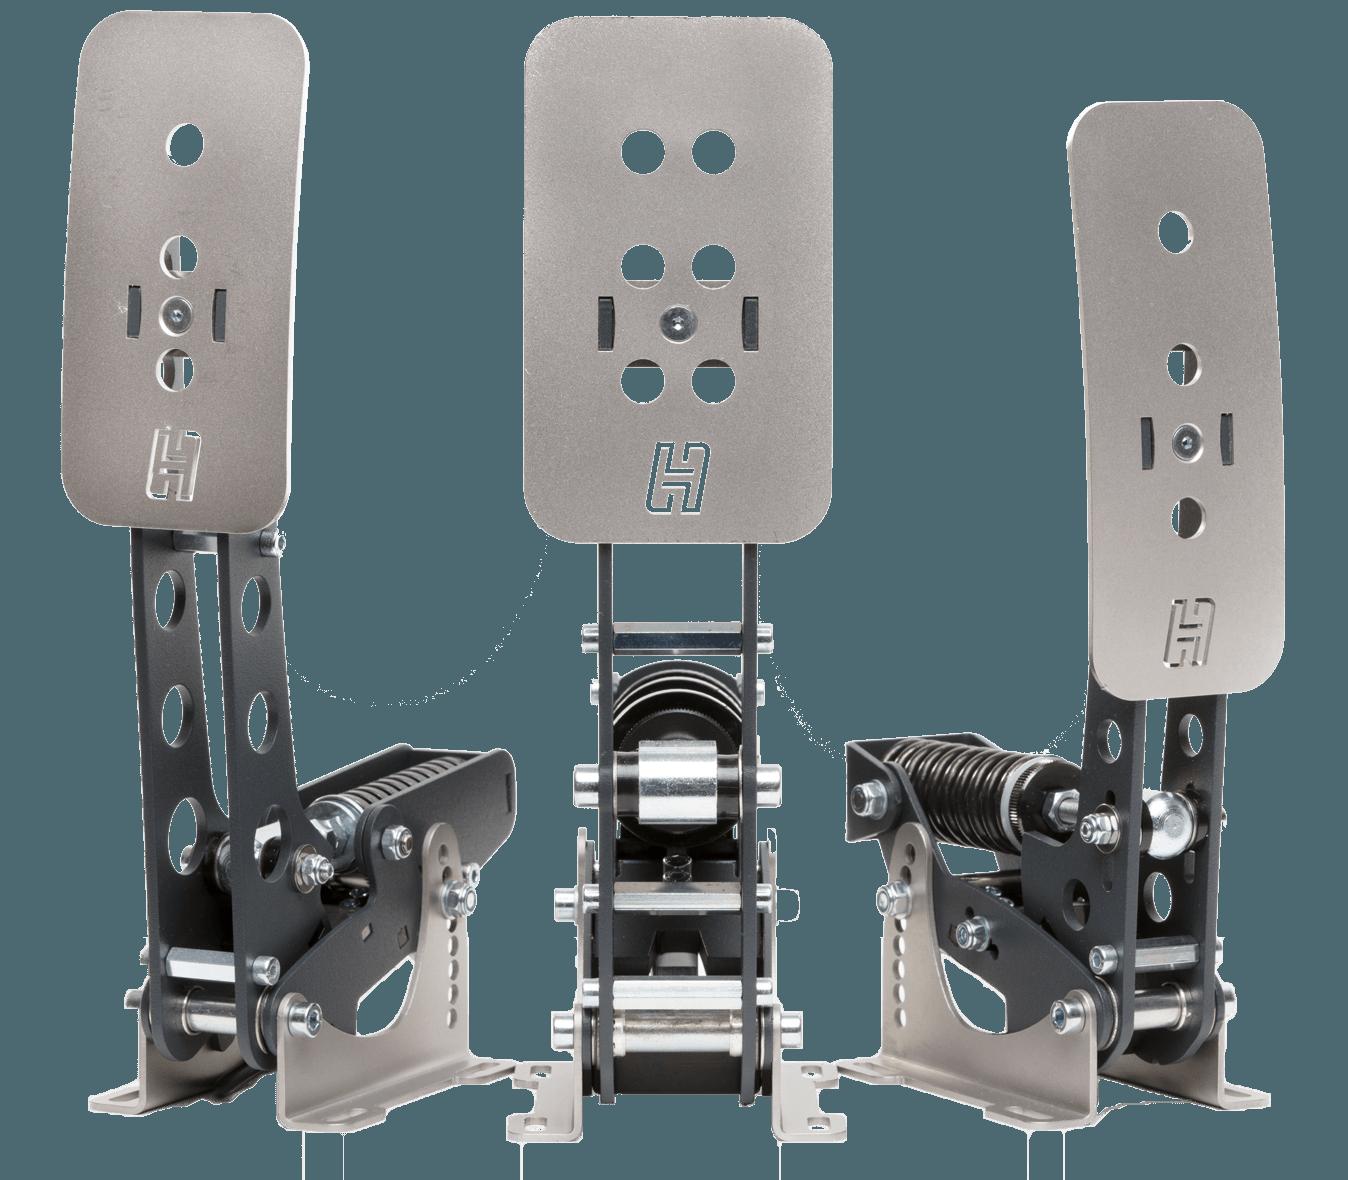 shop gperformance eu | Professional SimRacing Equipment